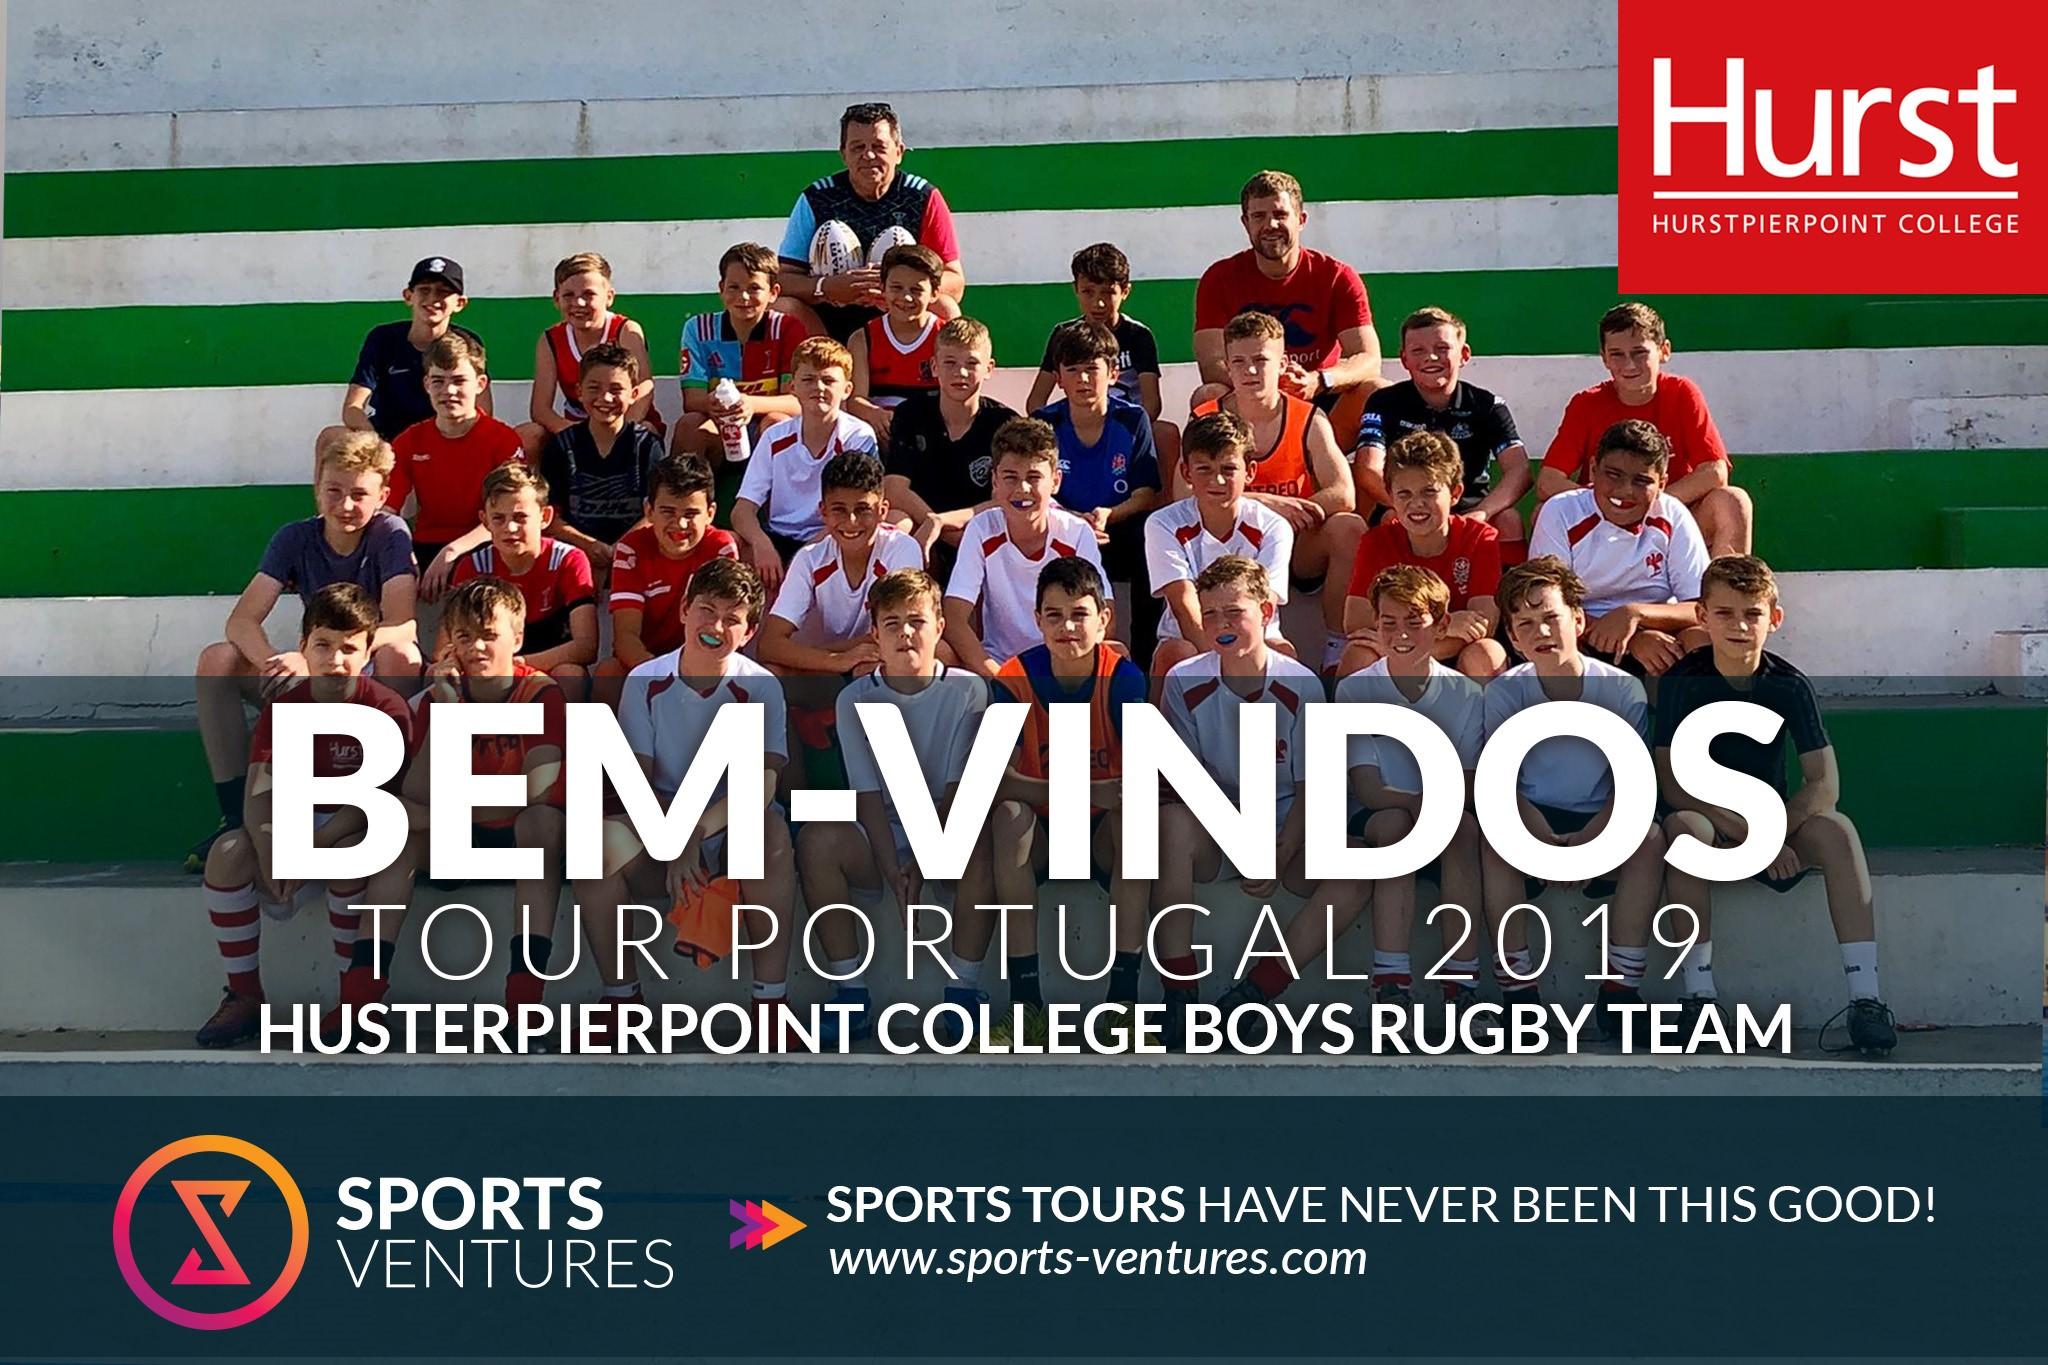 Hurstpierpoint-College-Rugby-Tour-Portugal-Sports-Ventures